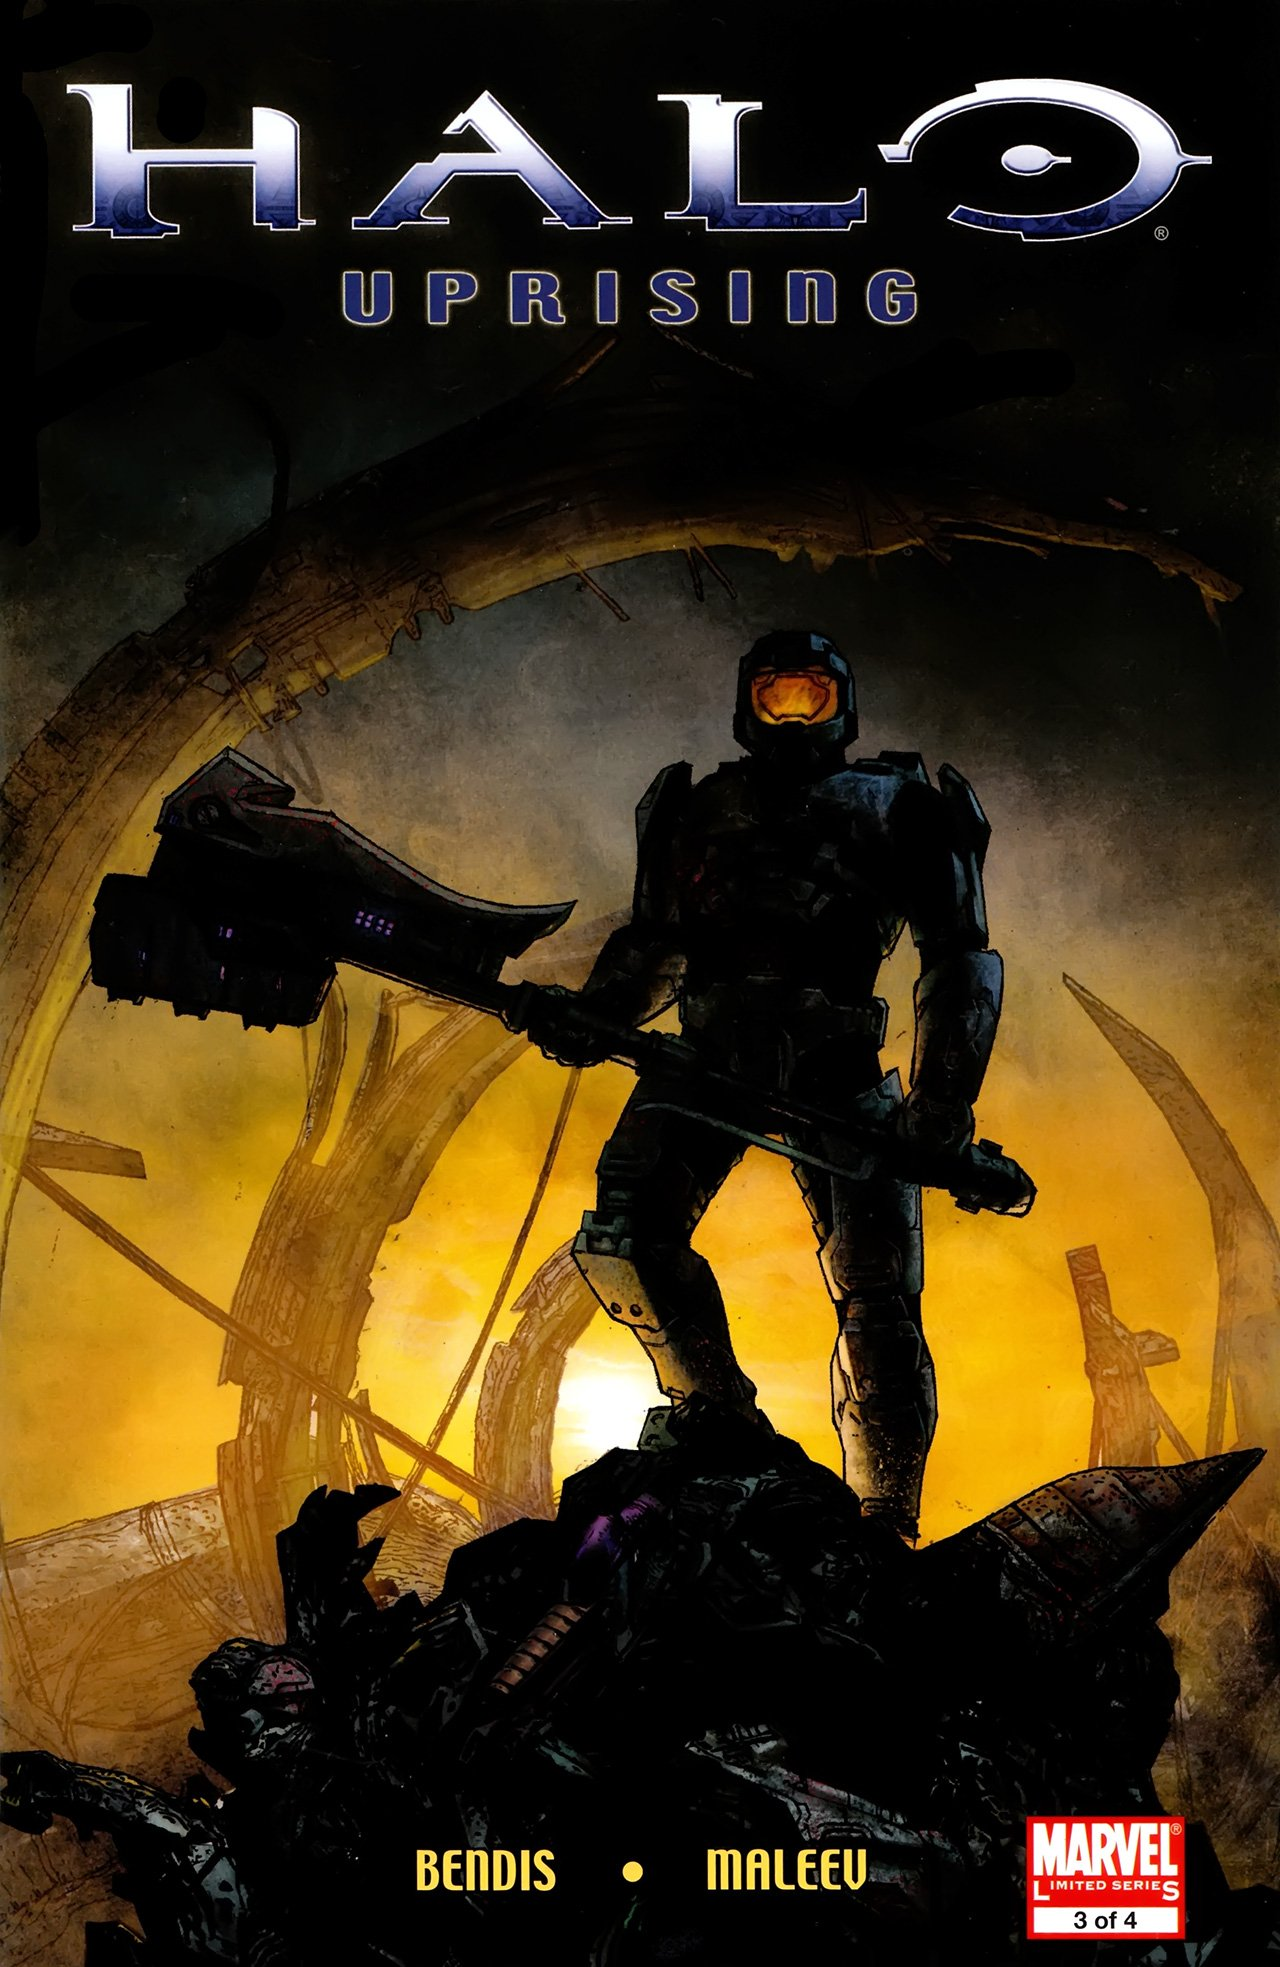 Halo - Uprising 03 (September 2008)